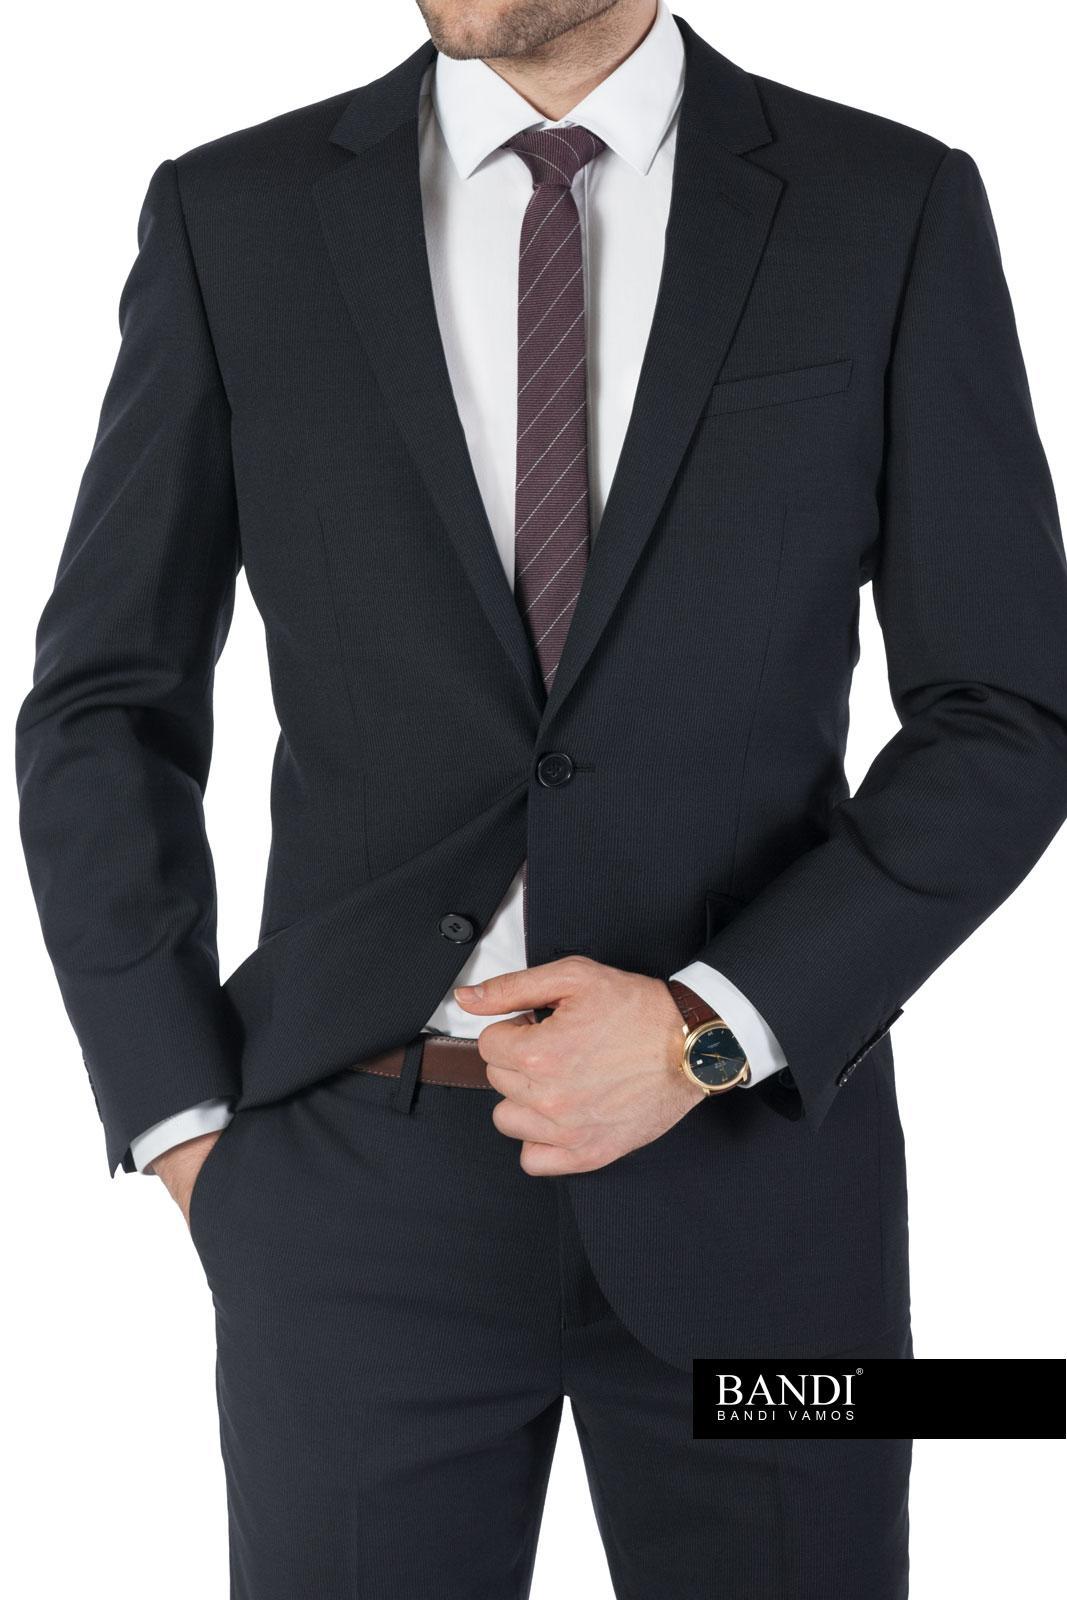 Příklad pracovního outfitu – matný oblek, bílá košile, tmavá kravata